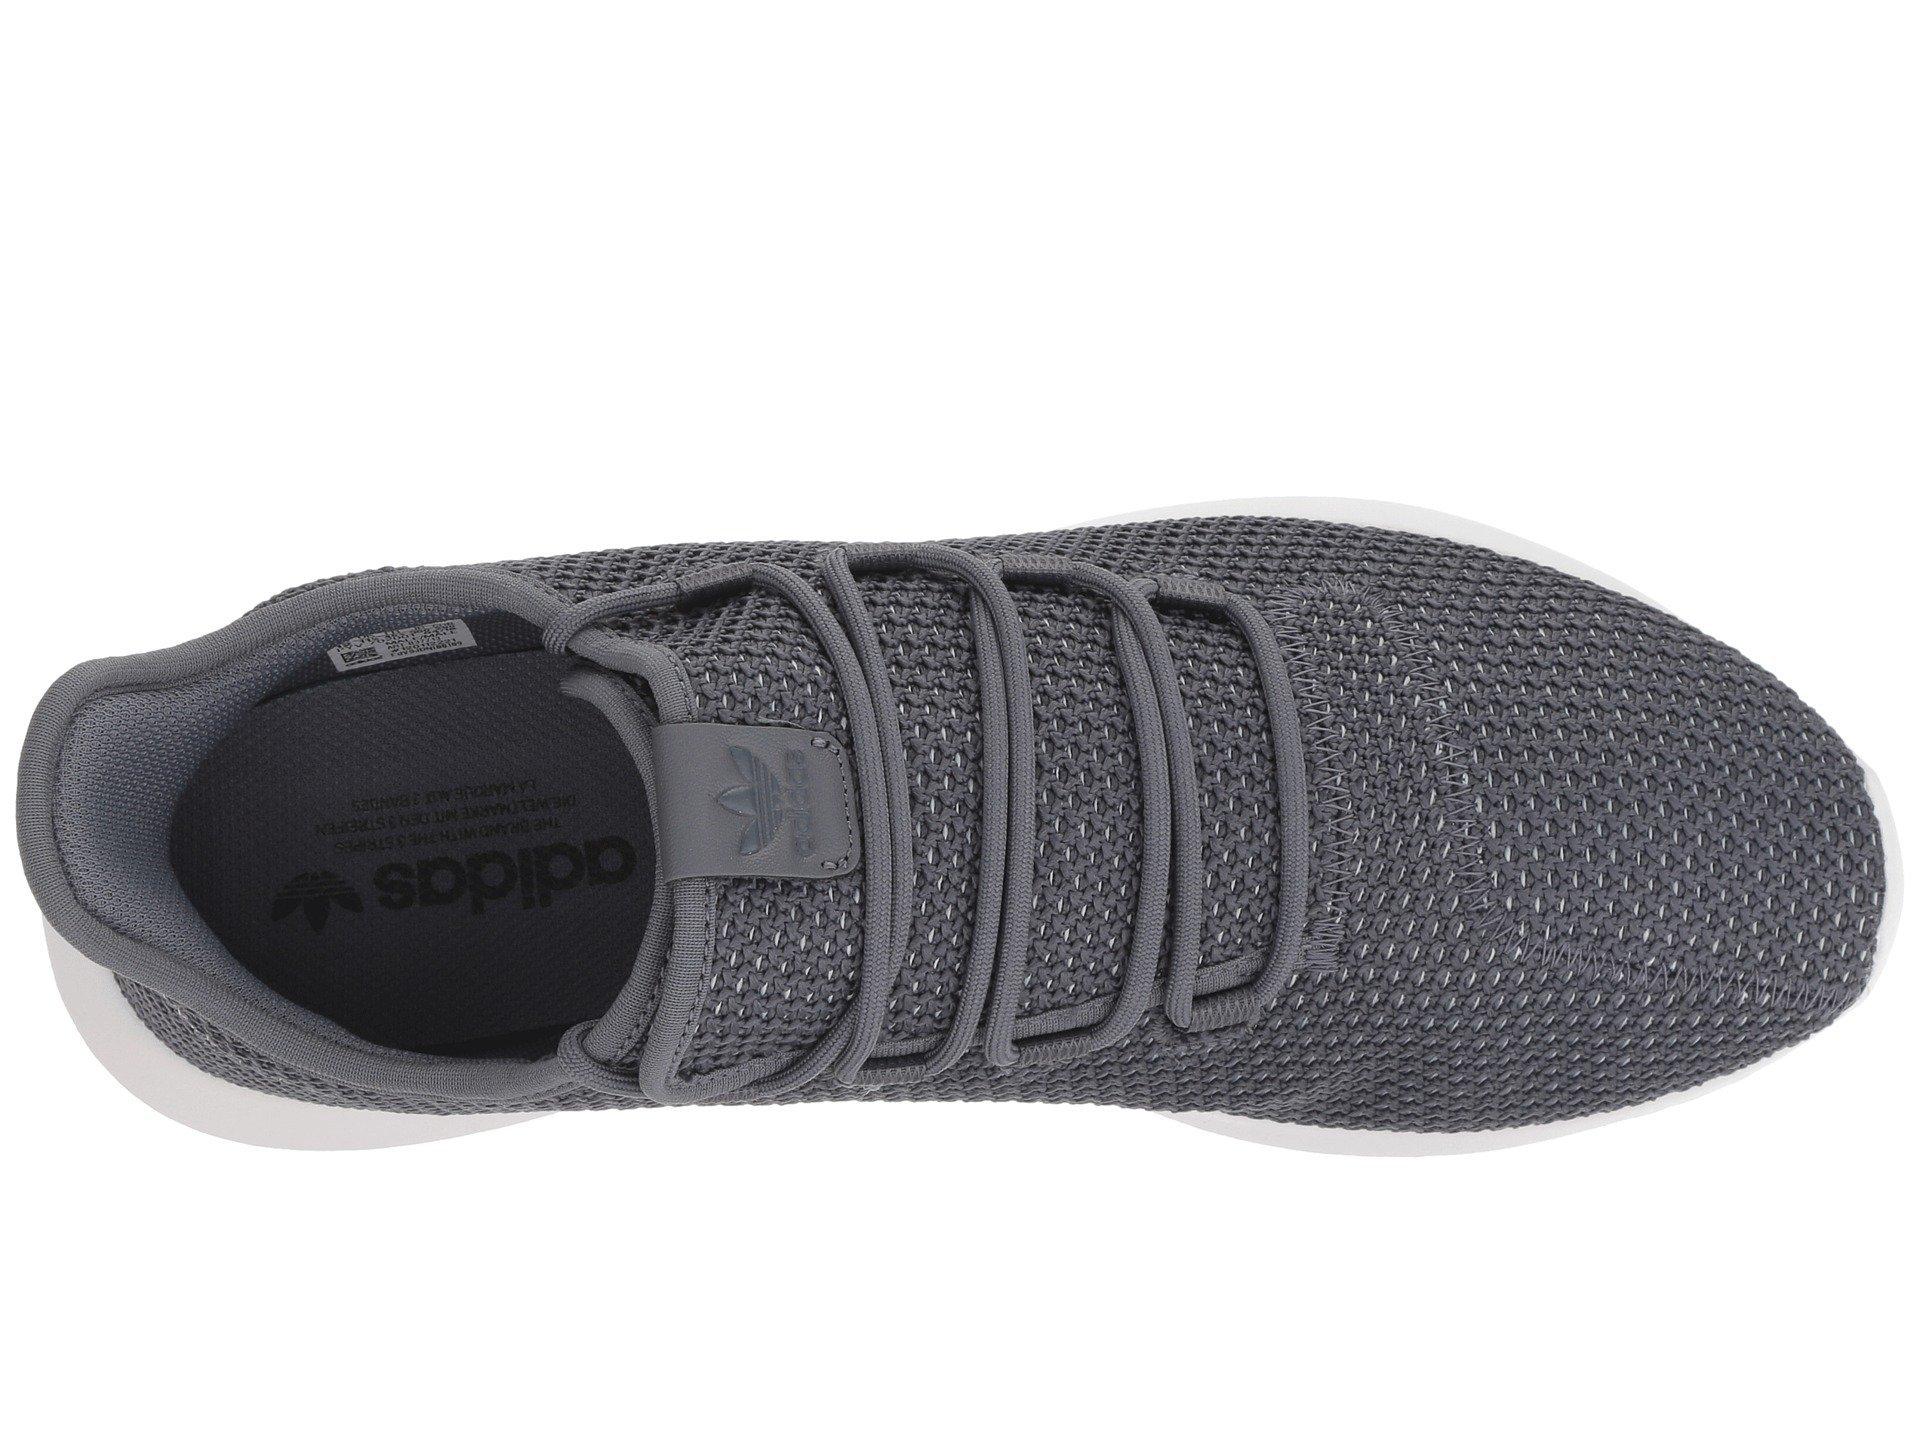 clear Tubular Shadow Grey Onyx Originals white Ck Adidas wXHExB5qn